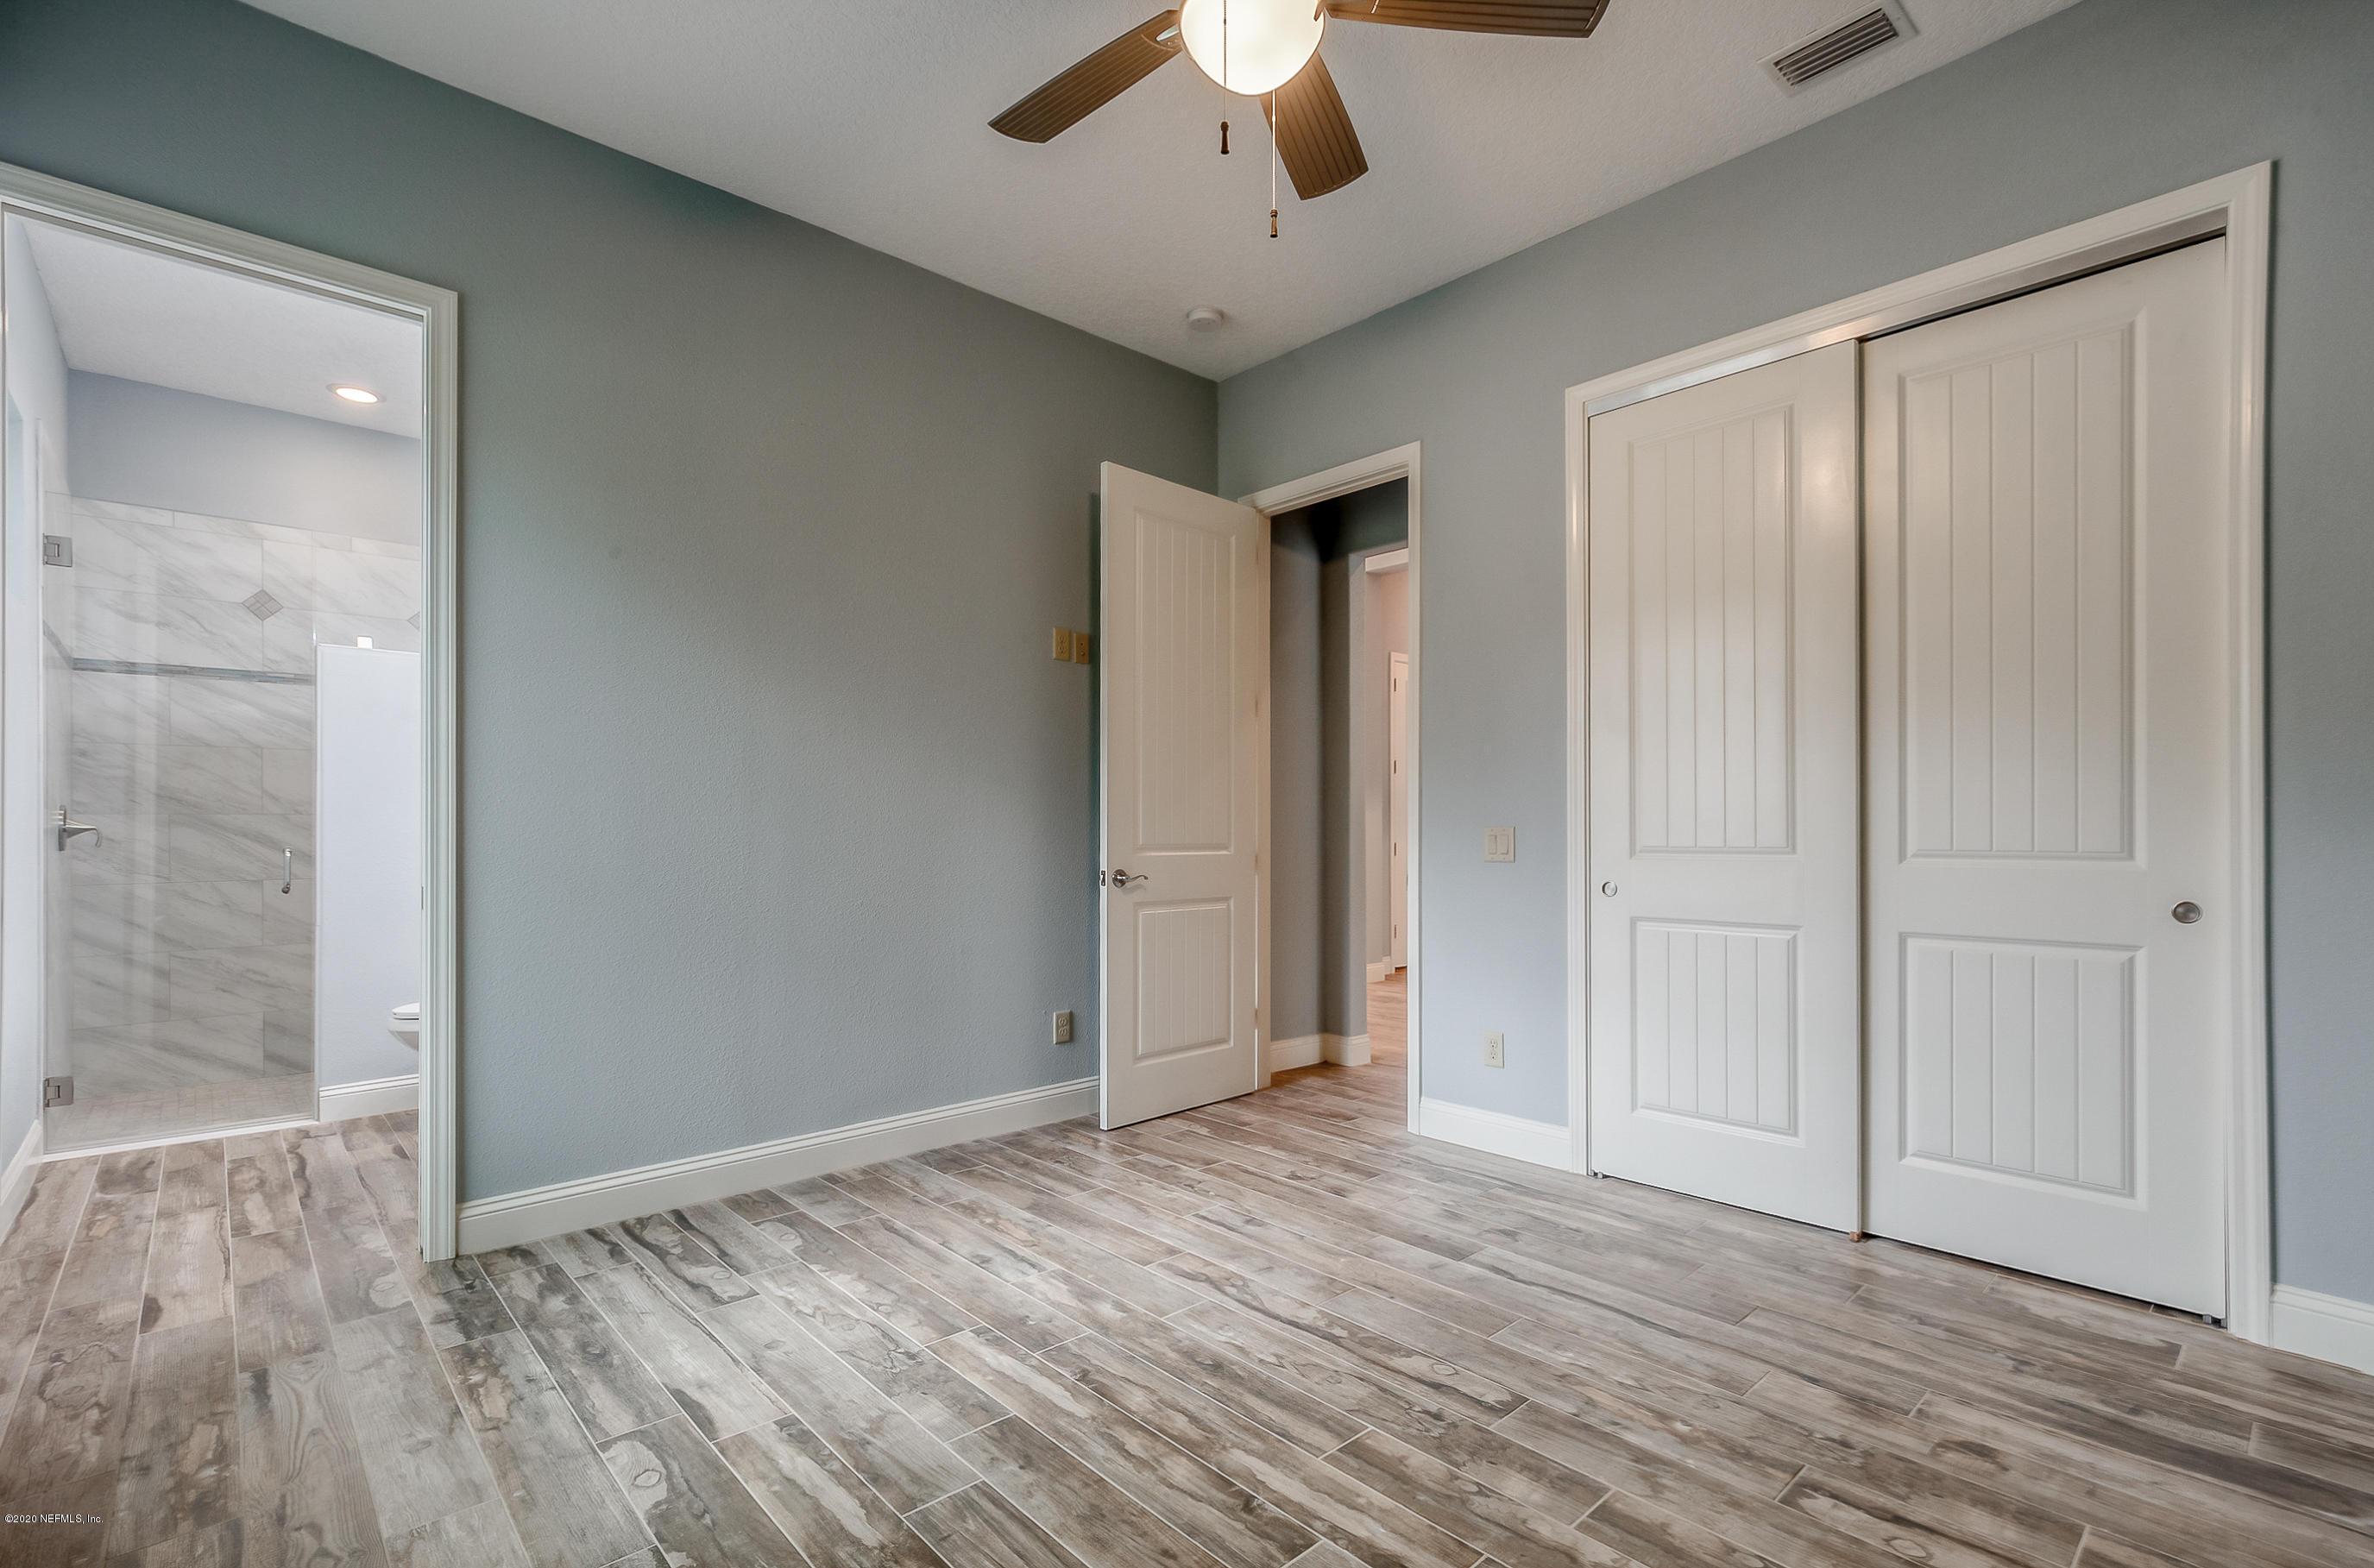 3 ALADDIN, JACKSONVILLE, FLORIDA 32223, 4 Bedrooms Bedrooms, ,3 BathroomsBathrooms,Residential,For sale,ALADDIN,1079730